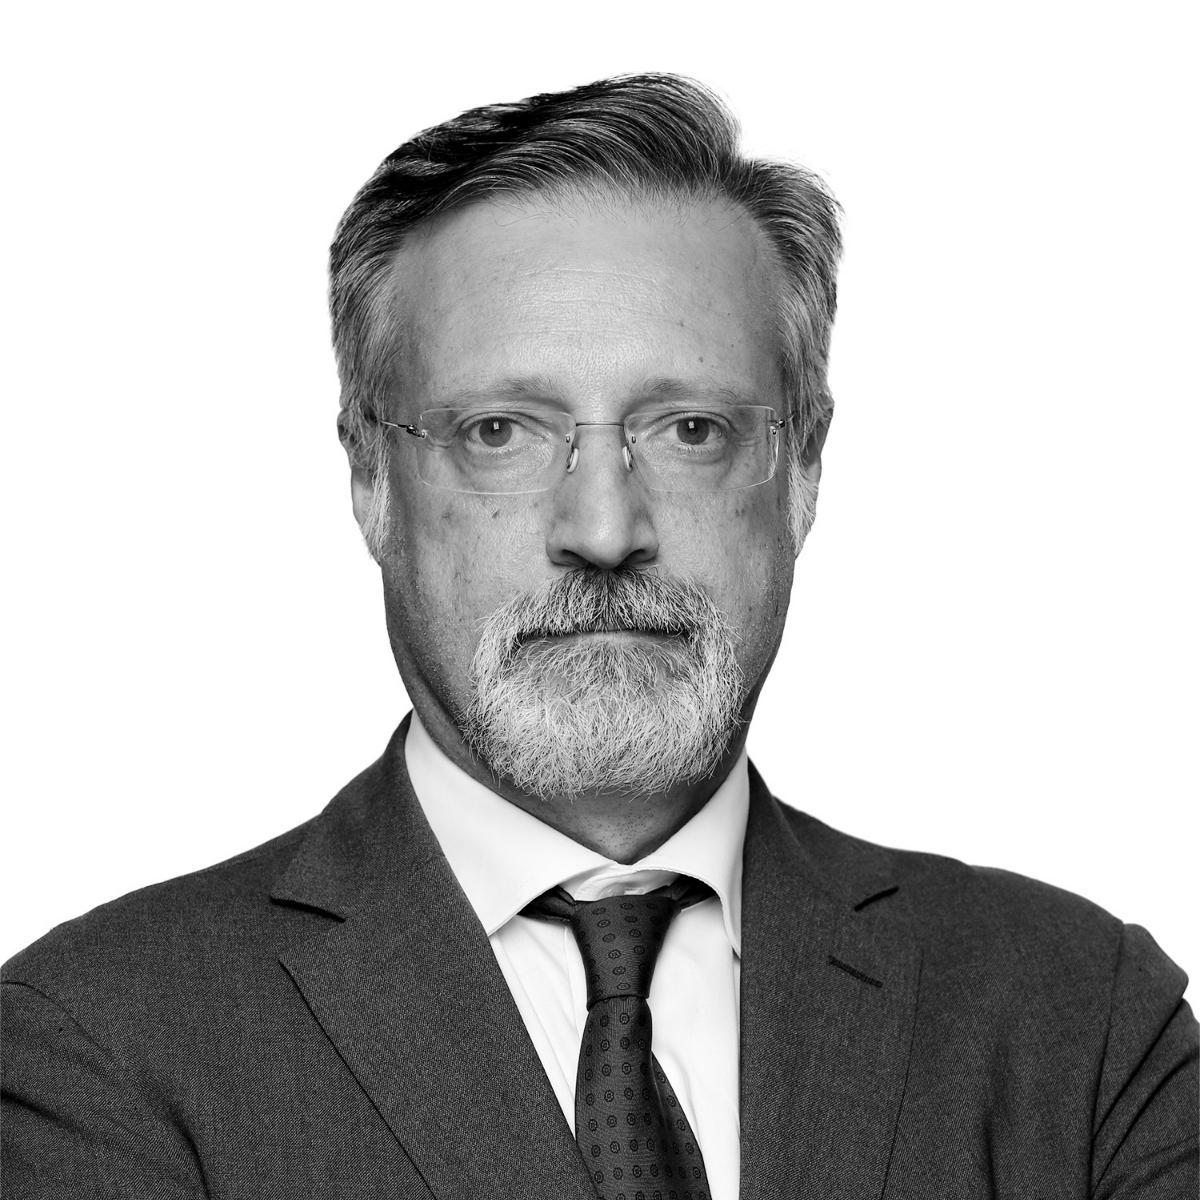 Francesco M. Renne